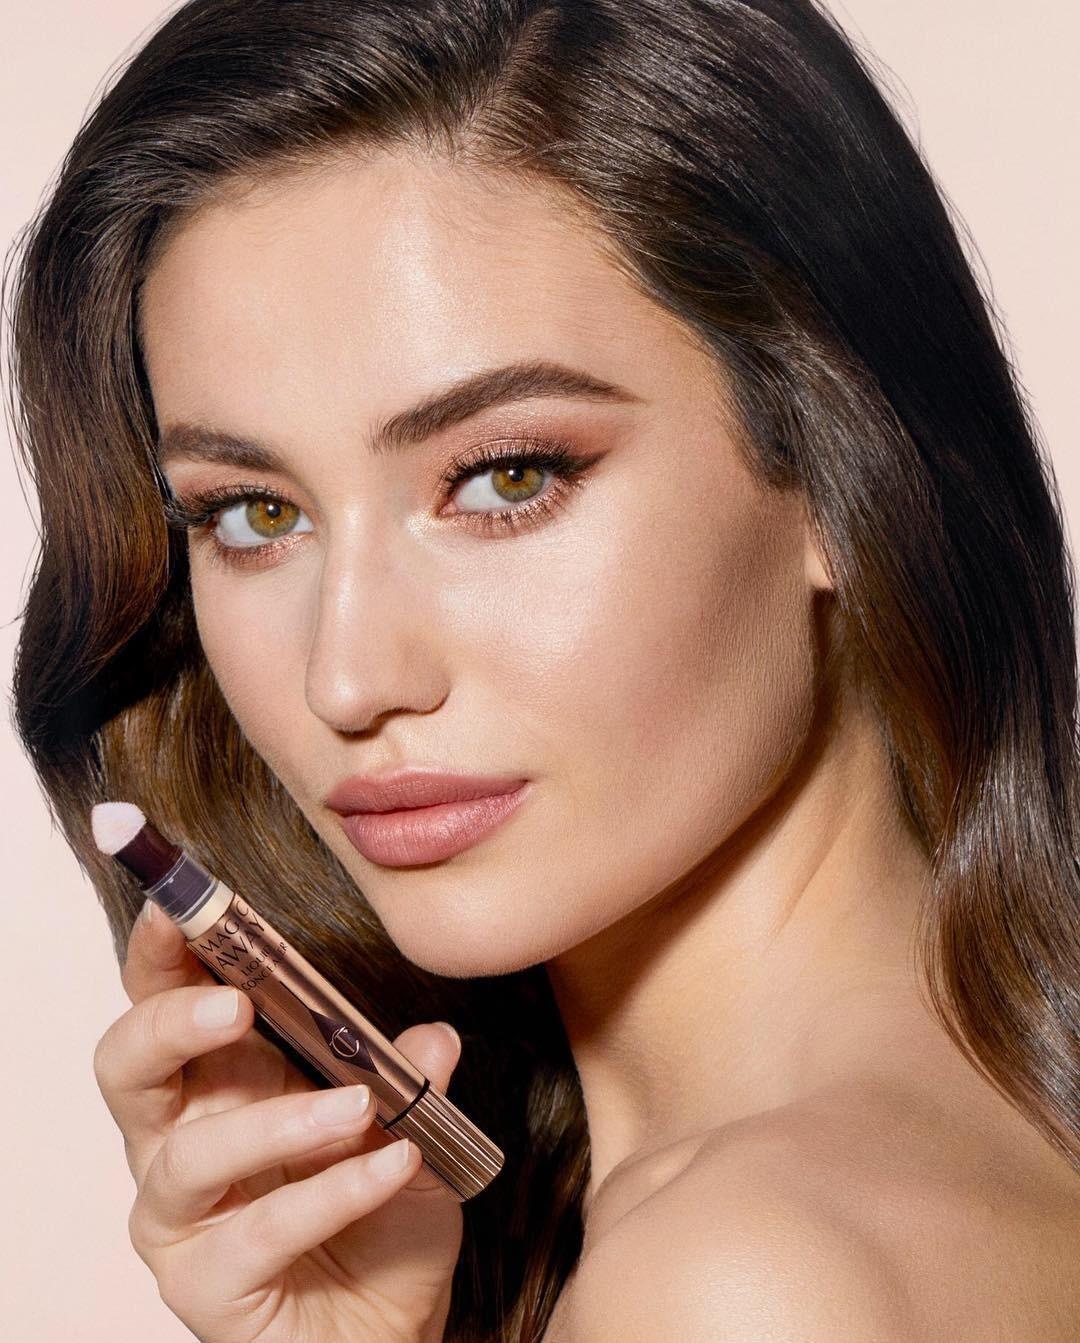 Charlotte Tilbury Makeup Models ID , Model ID , Bellazon